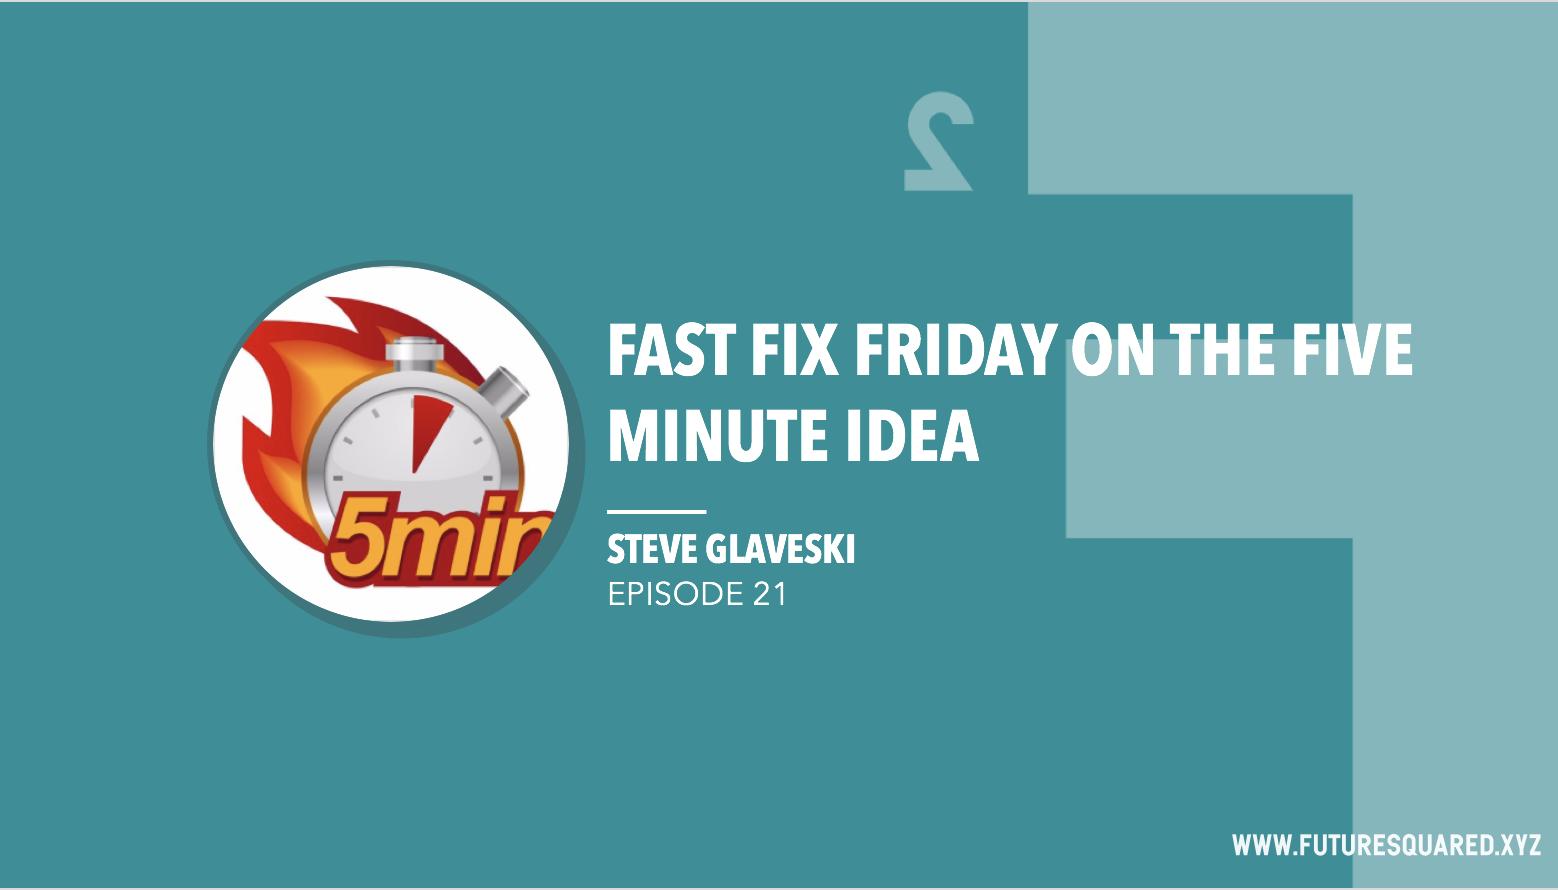 Future Squared Episode #21: Fast Fix Friday on the Five Minute Idea